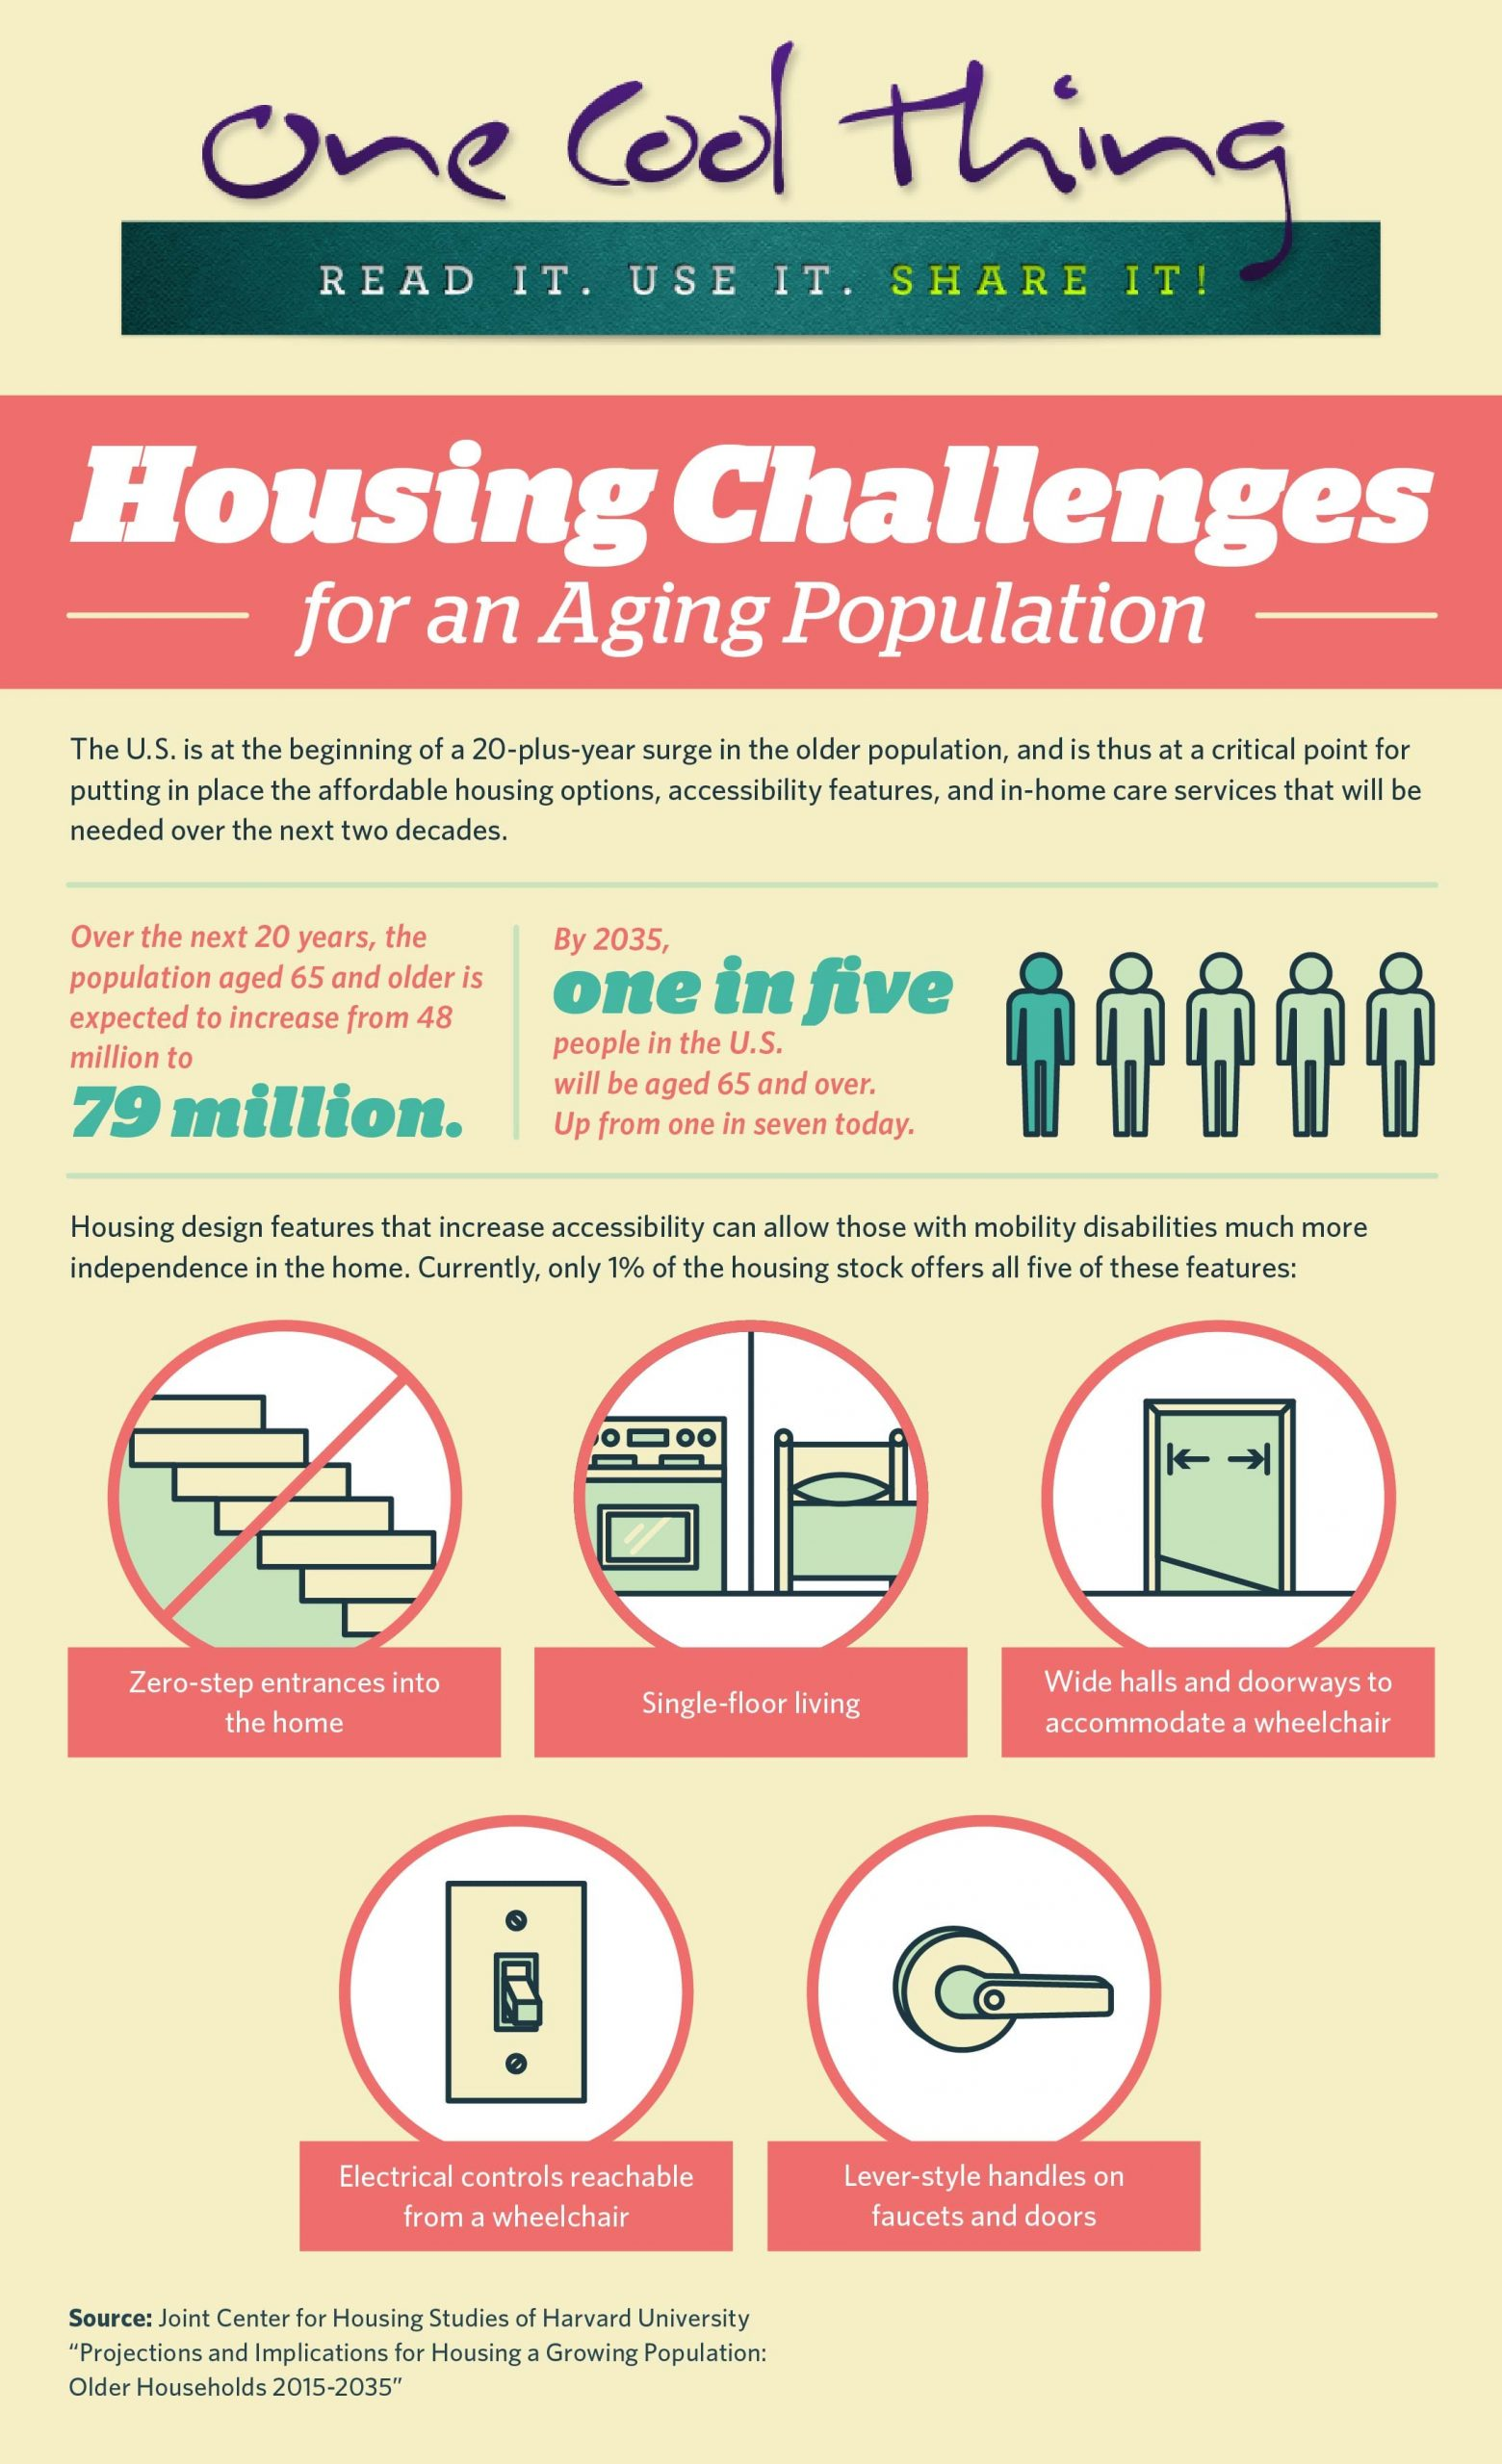 Aging Home Owner Population Statistics